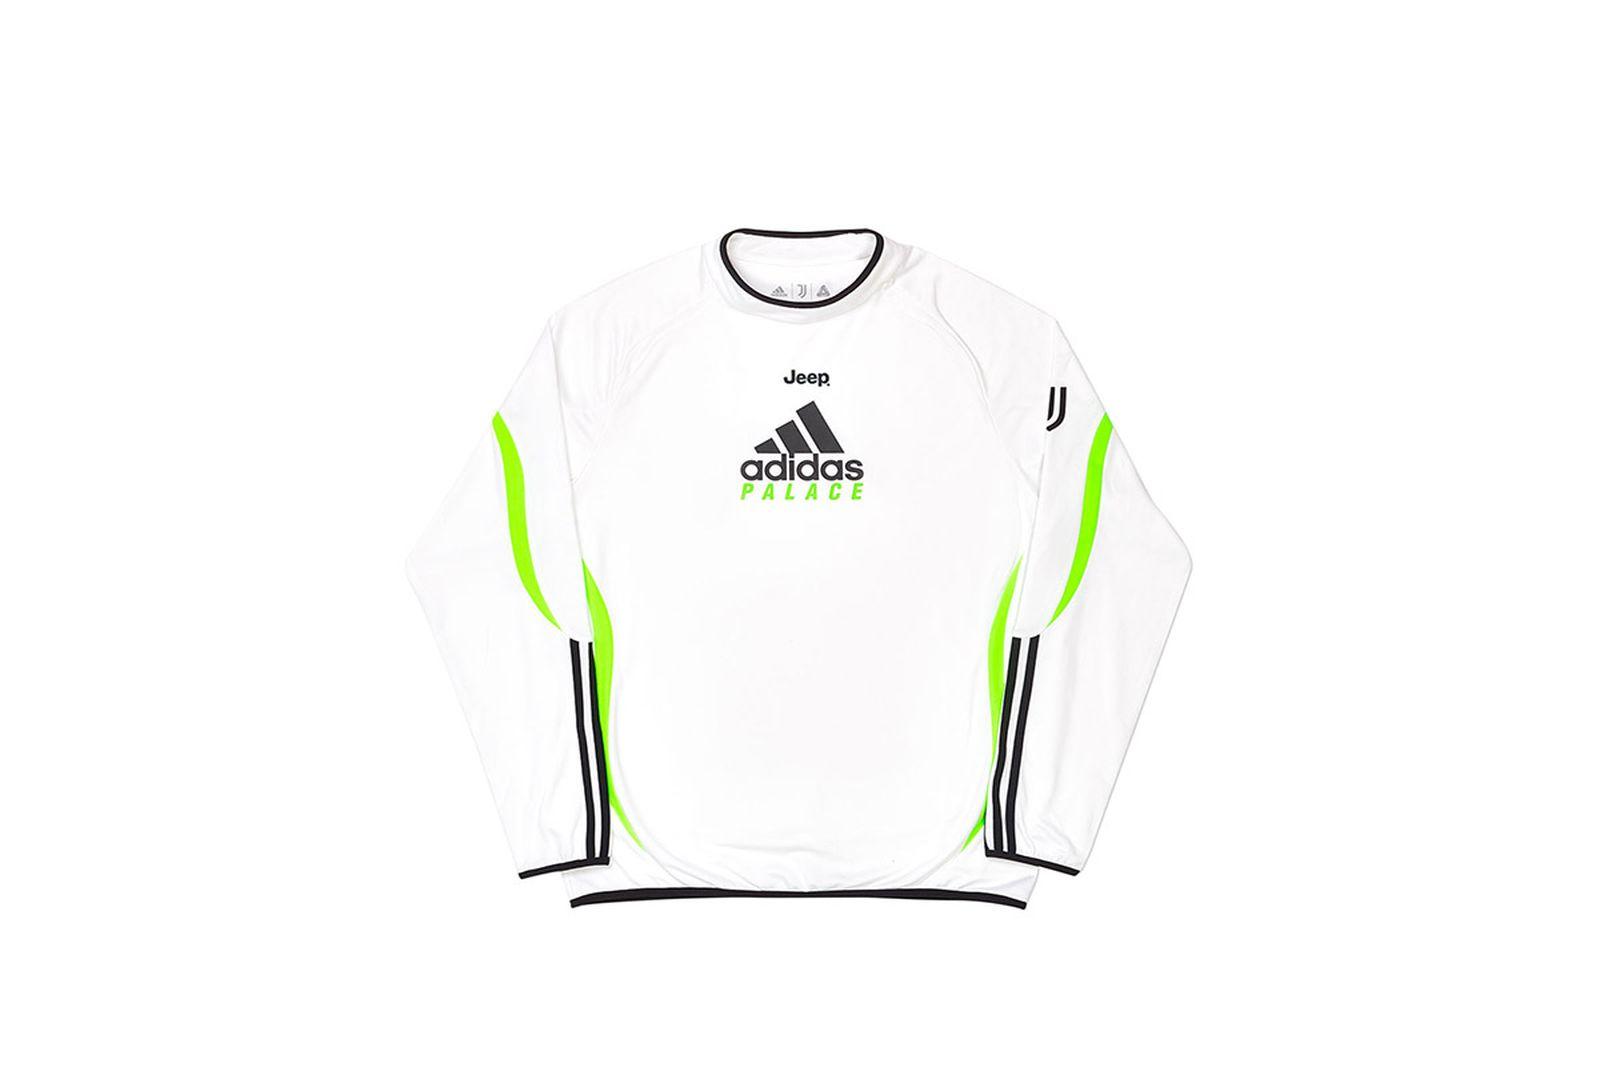 Palace-2019-Adidas-Juventus-Training-Top-white-19576